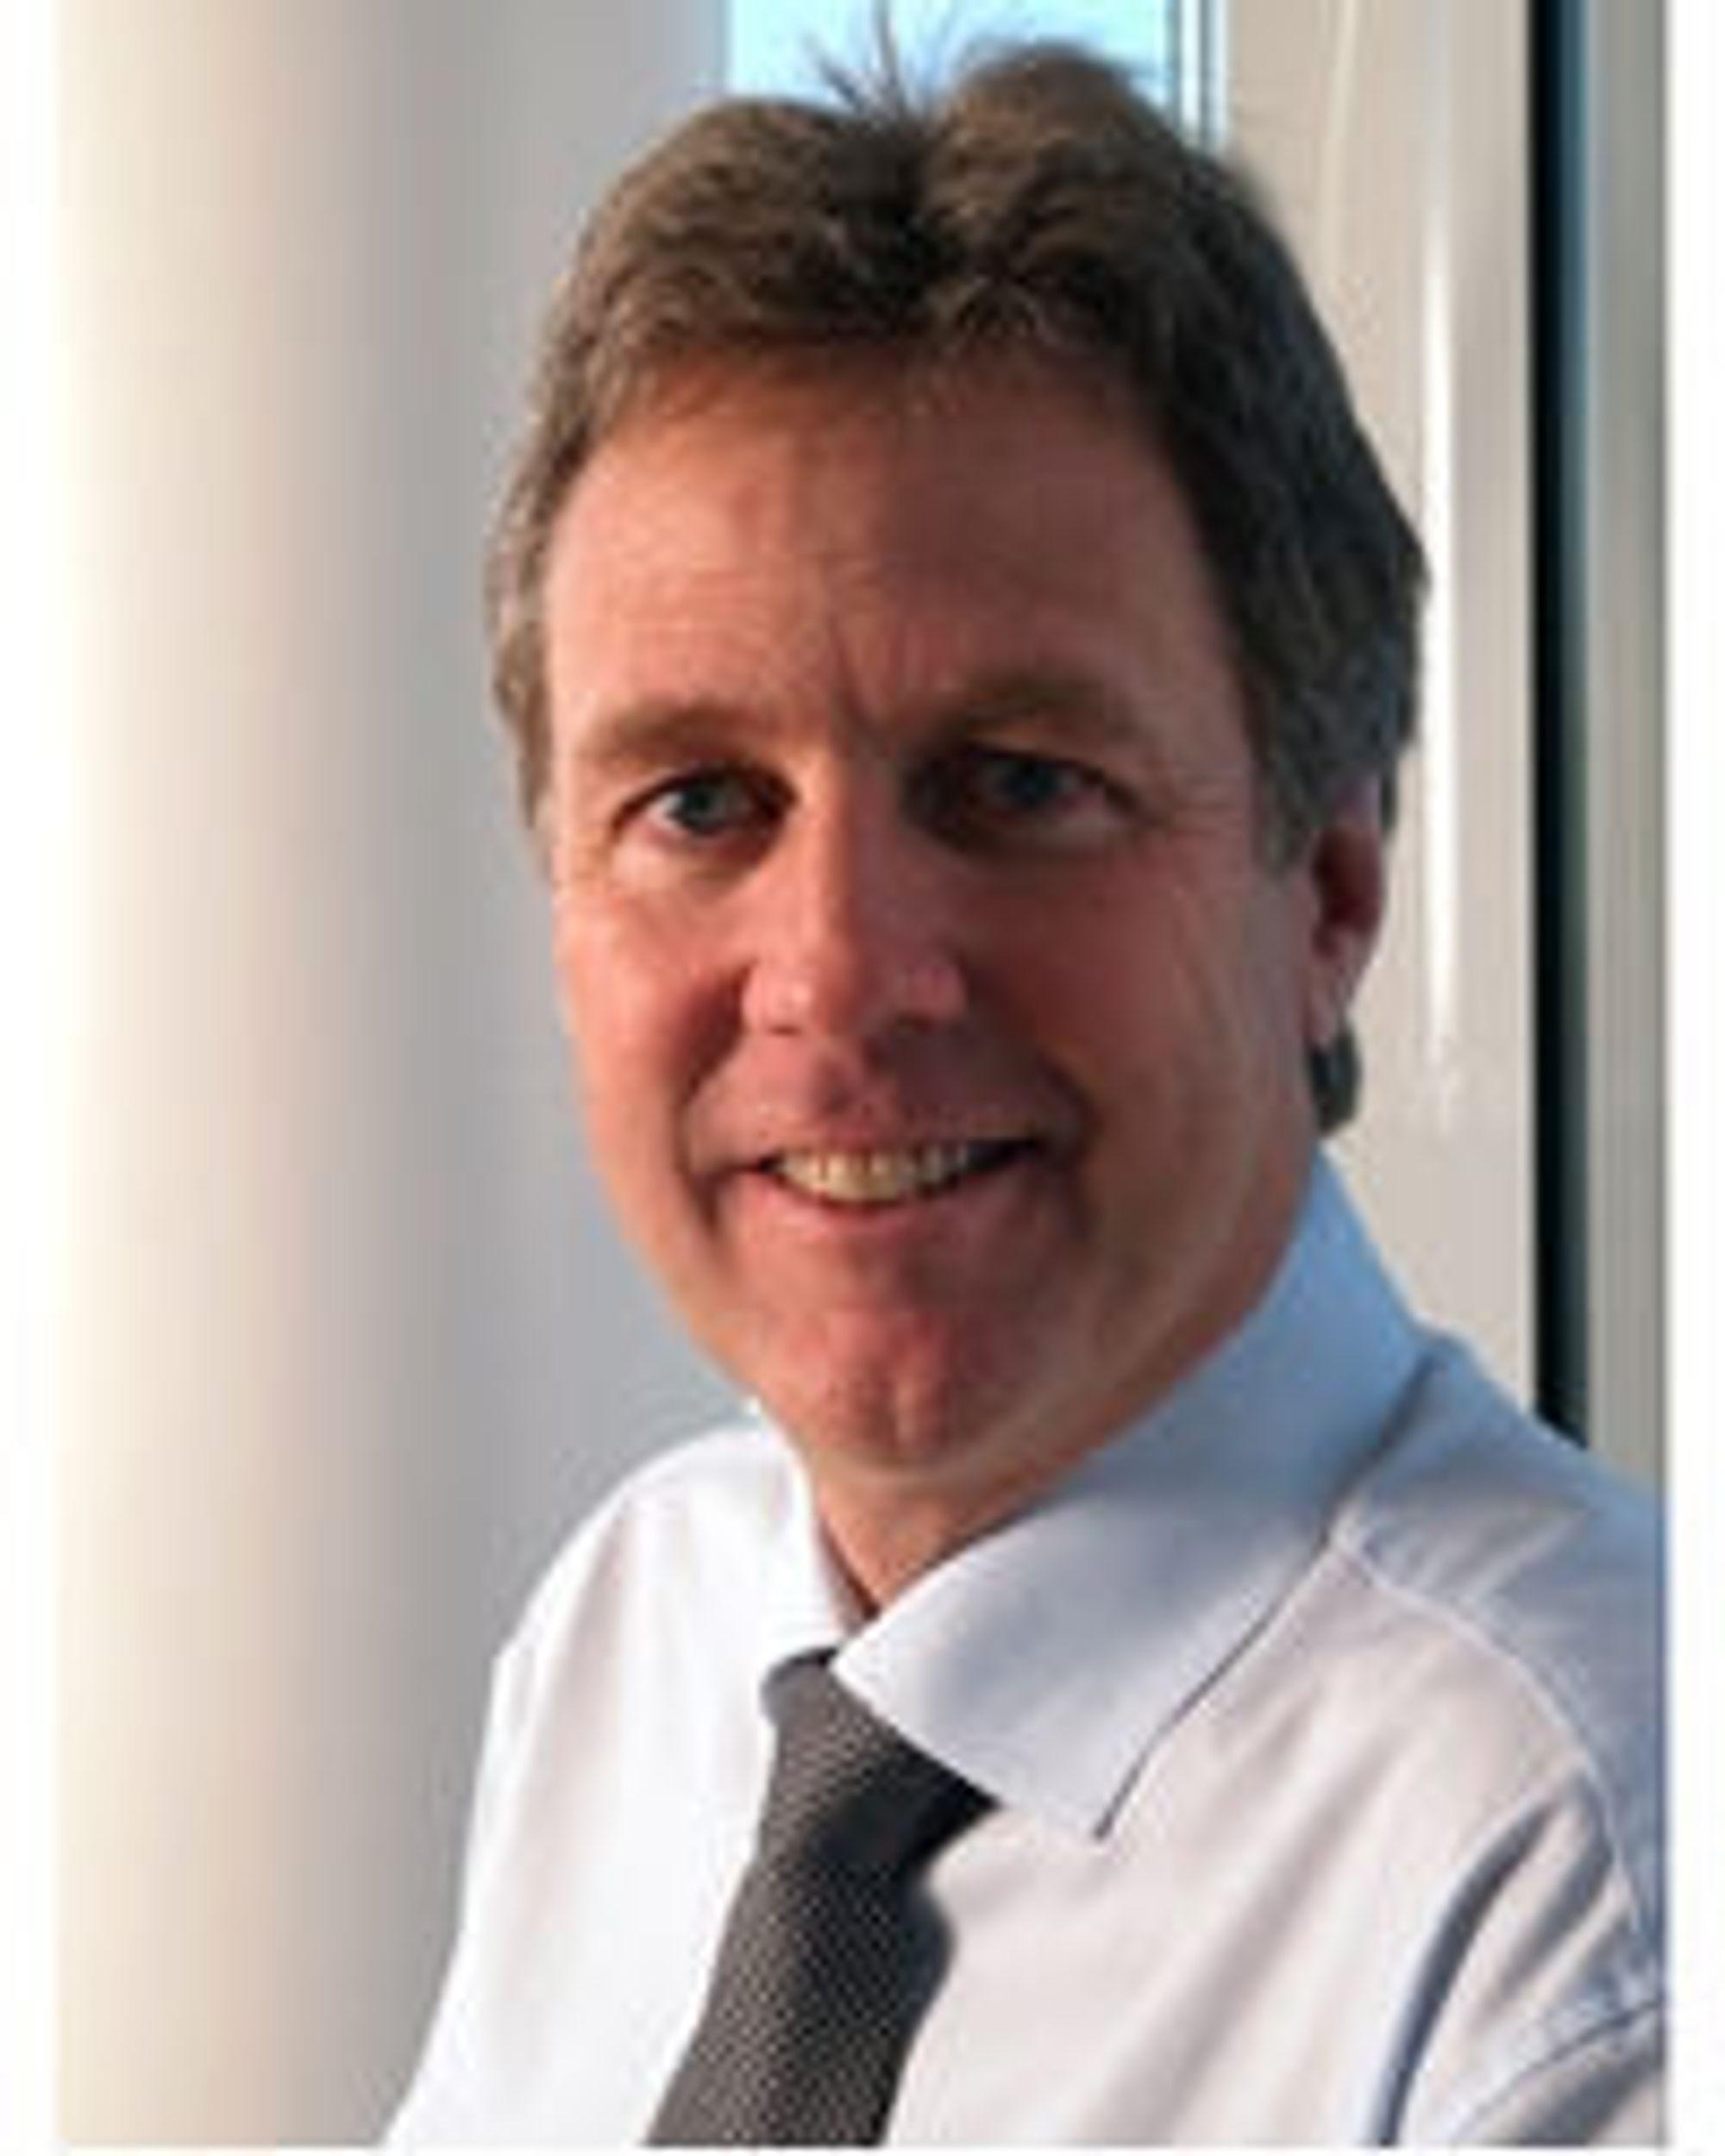 Trimmer drifts-fabrikken: Logica Norge-sjef Tor Malmo.